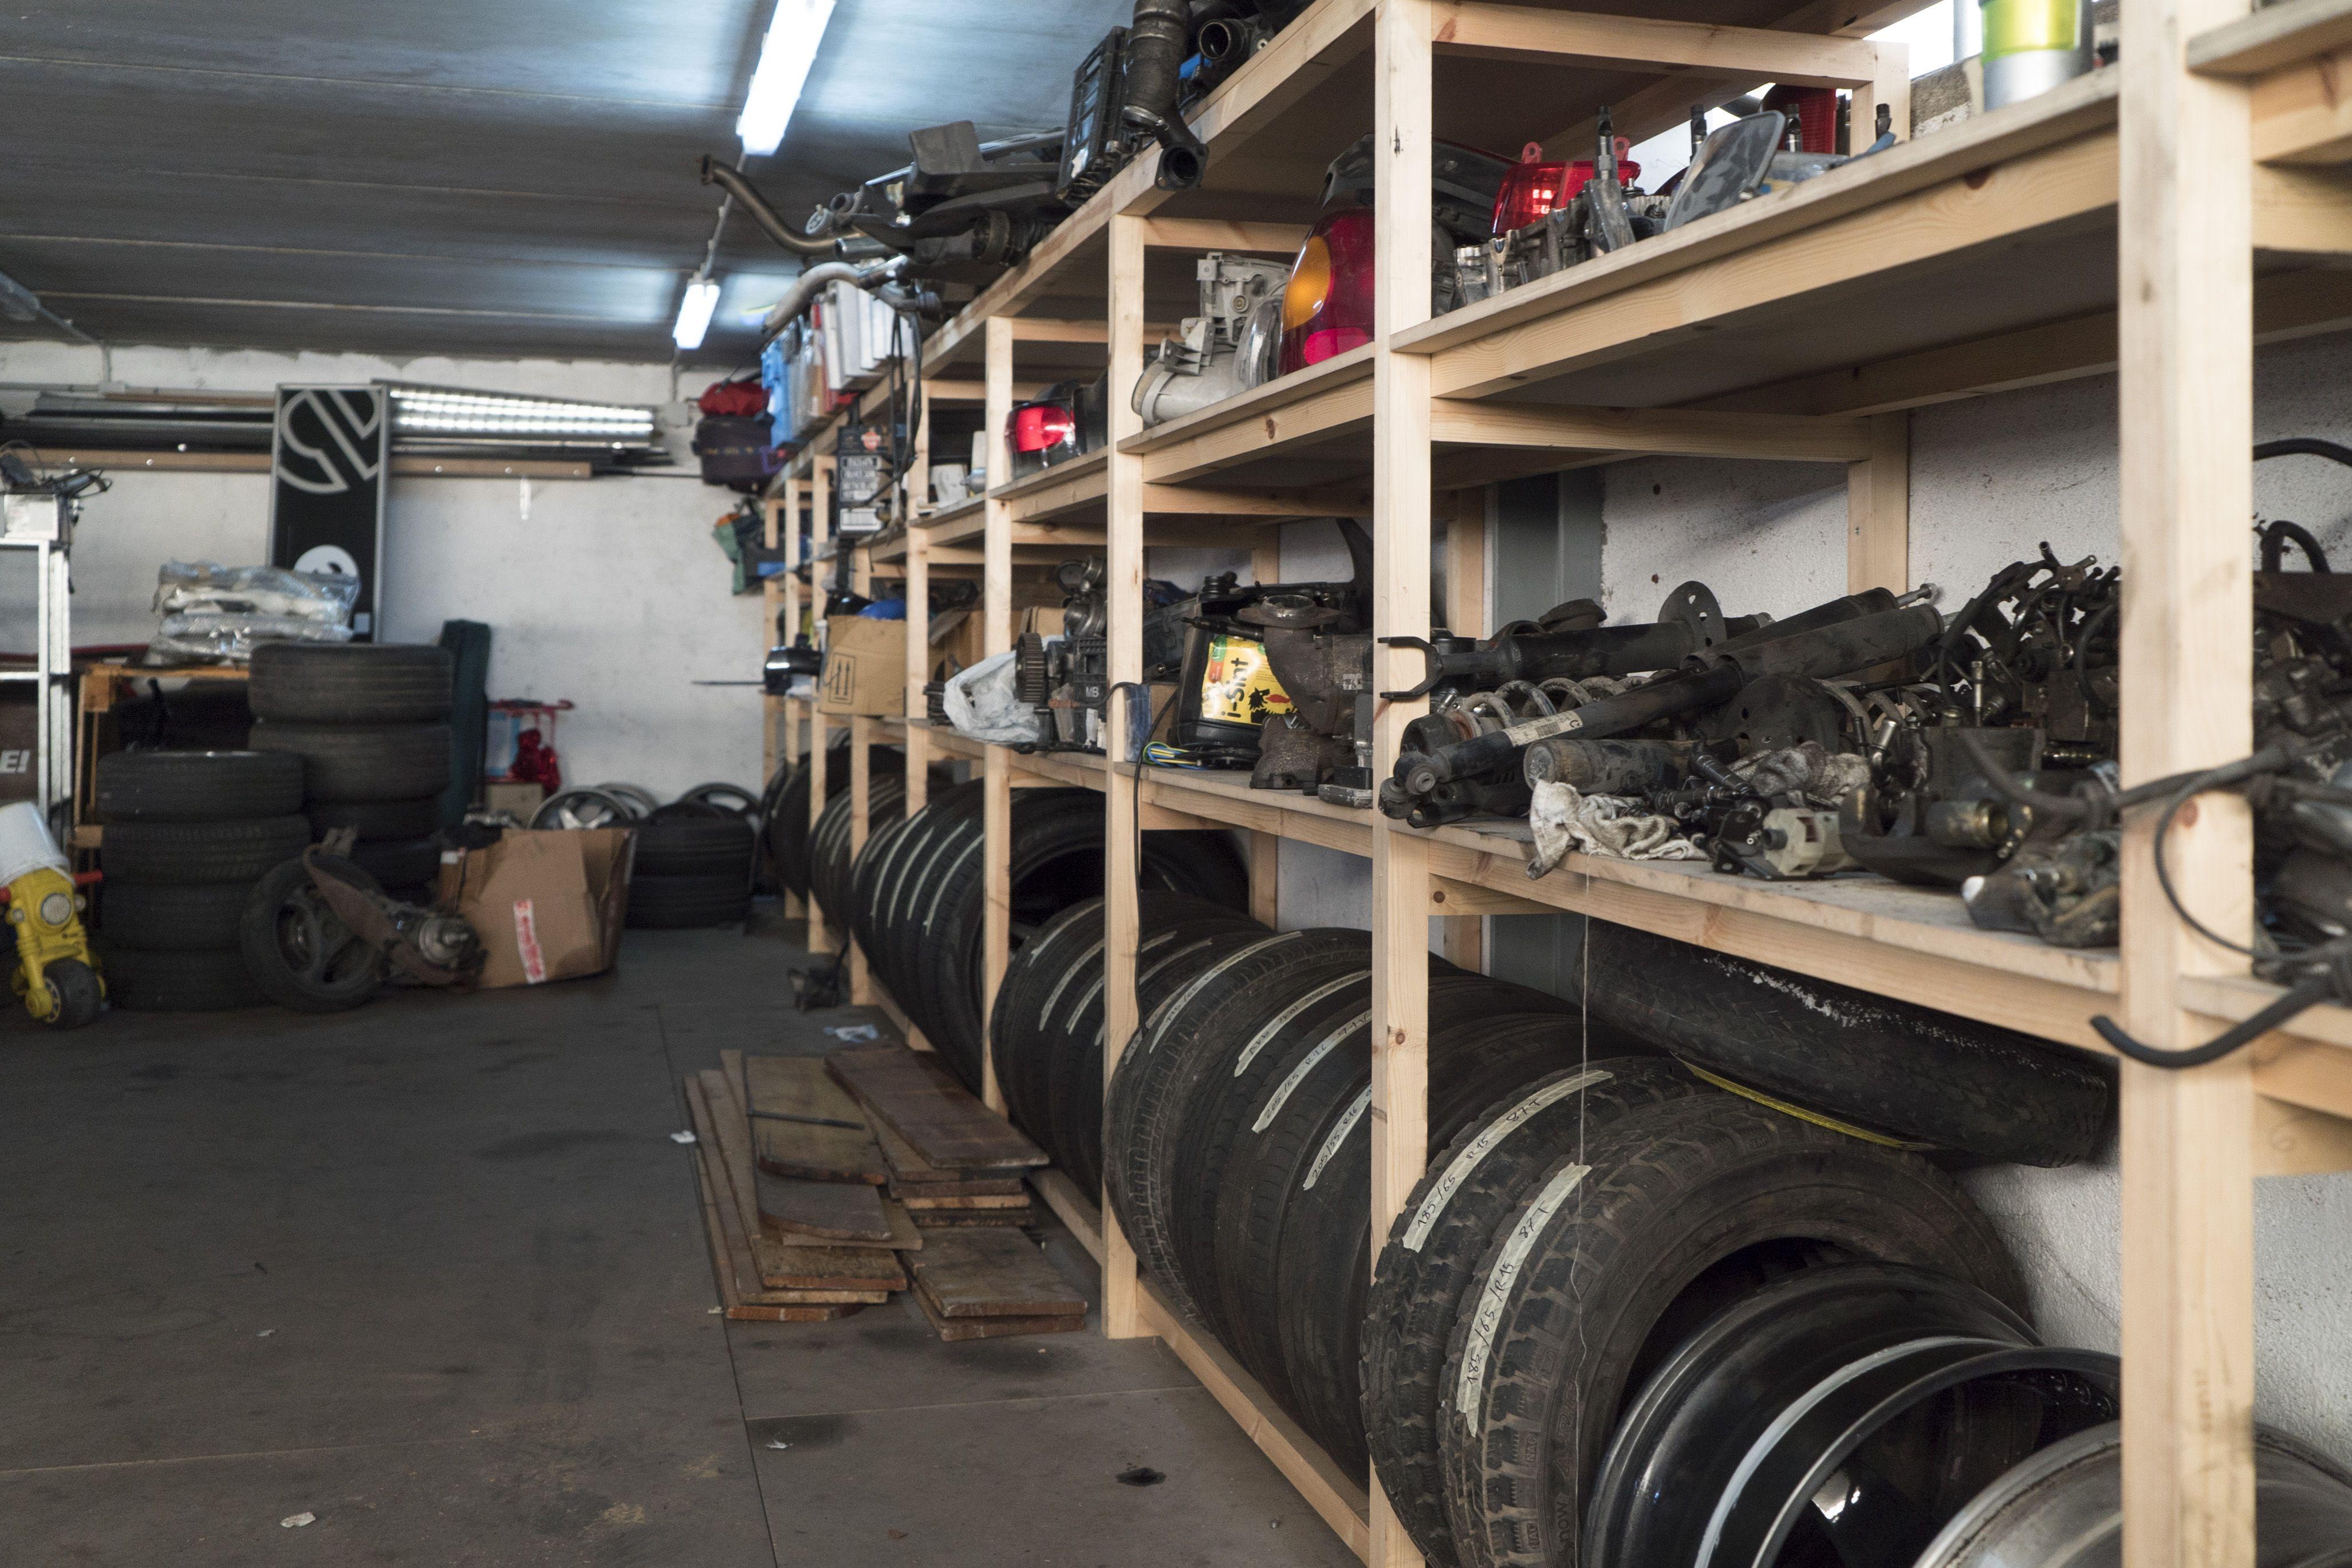 Venta de neumáticos en Bilbao